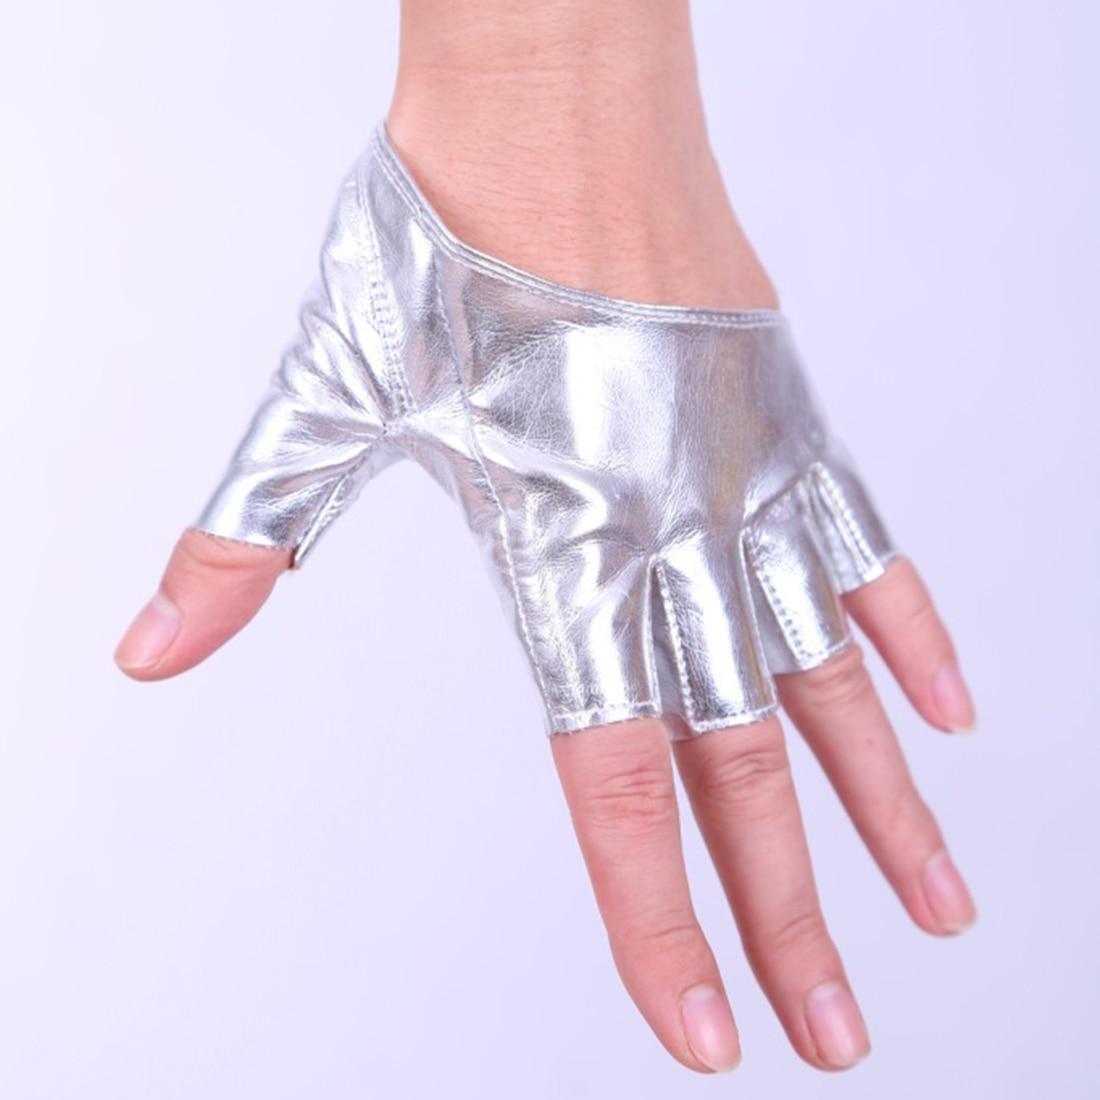 Fashion Women's Leather Gloves Half Finger Gloves 2018 New Fingerless Driving Show Jazz Gloves Pole Dance Performance Gloves Hot